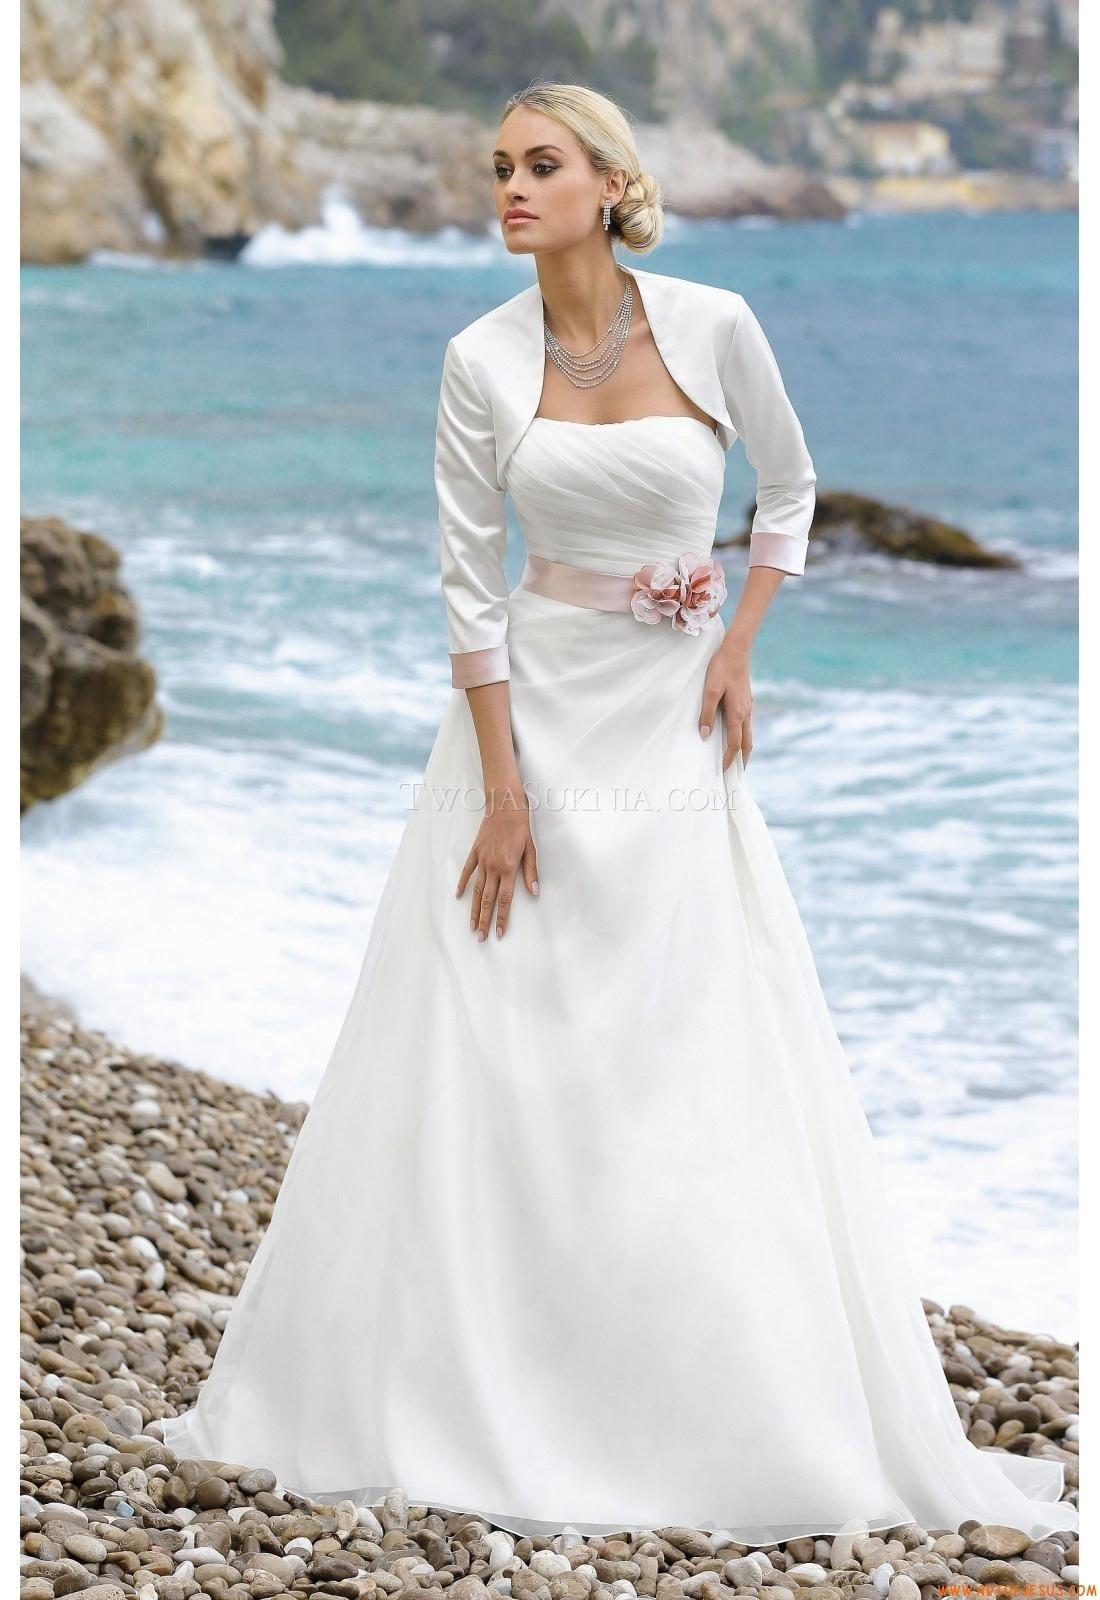 10 Spektakulär Brautmode Günstig Spezialgebiet15 Perfekt Brautmode Günstig Vertrieb